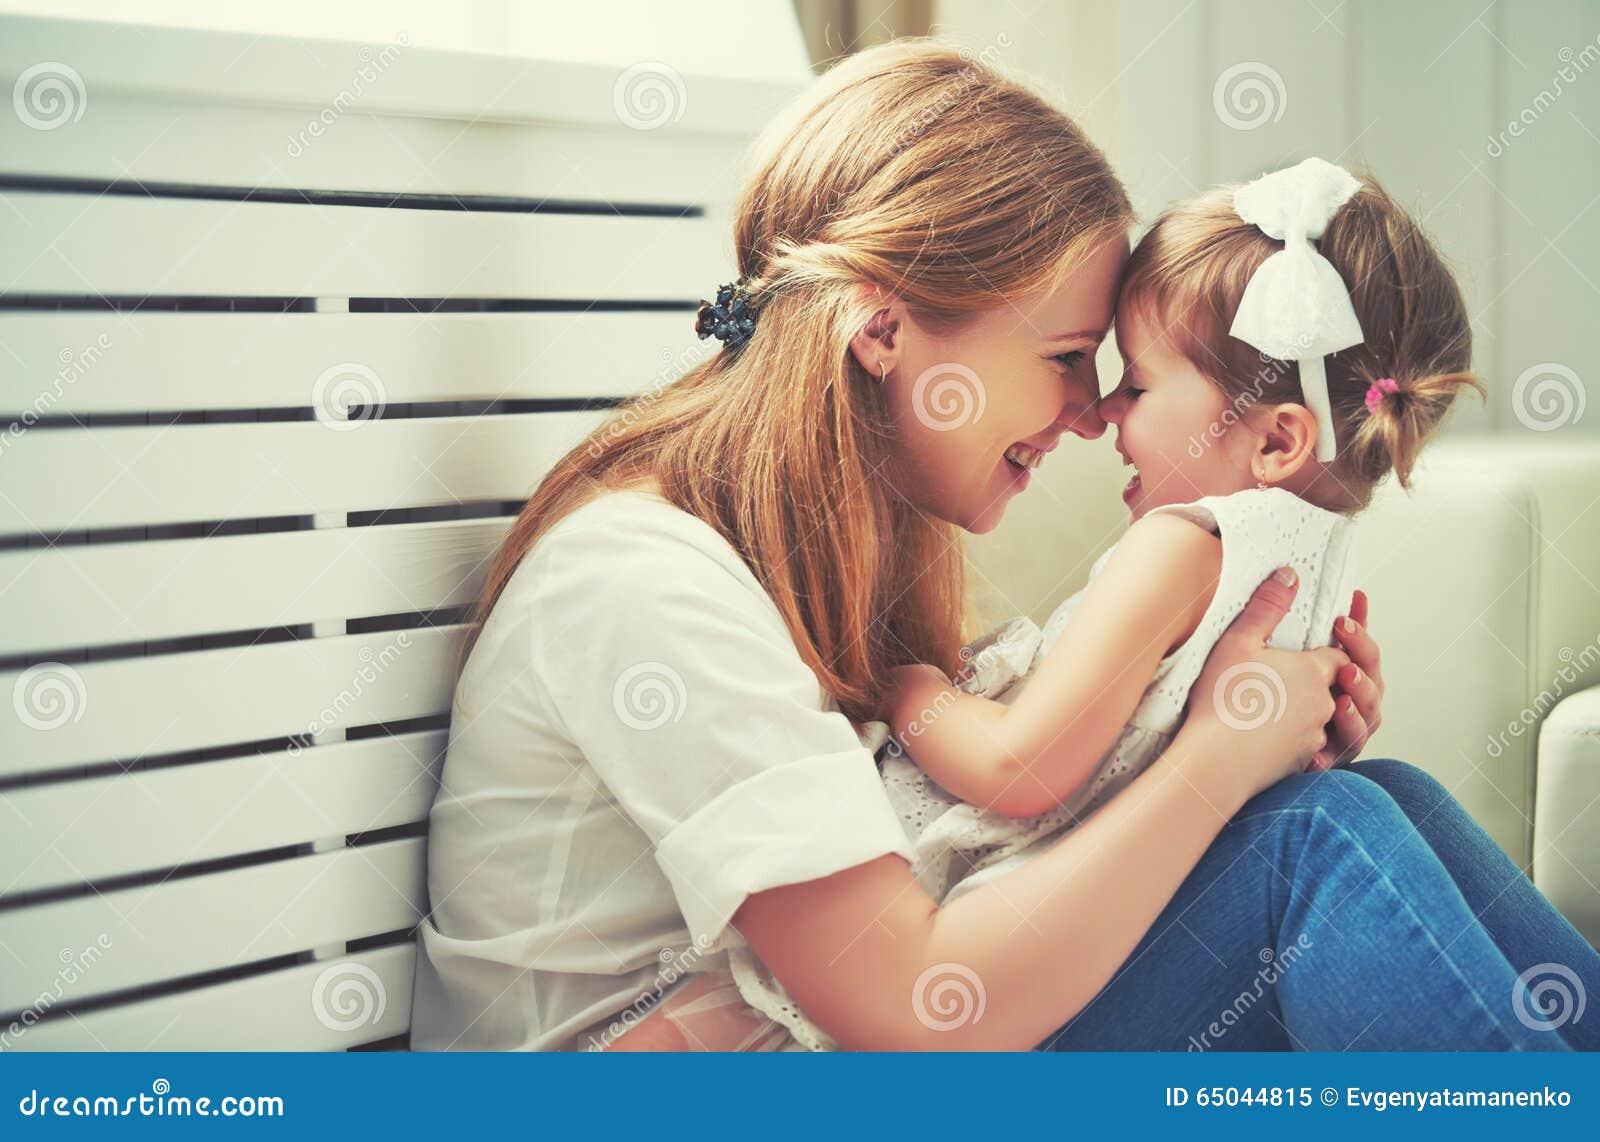 Famille affectueuse heureuse mère et enfant jouant, embrassant et hugg